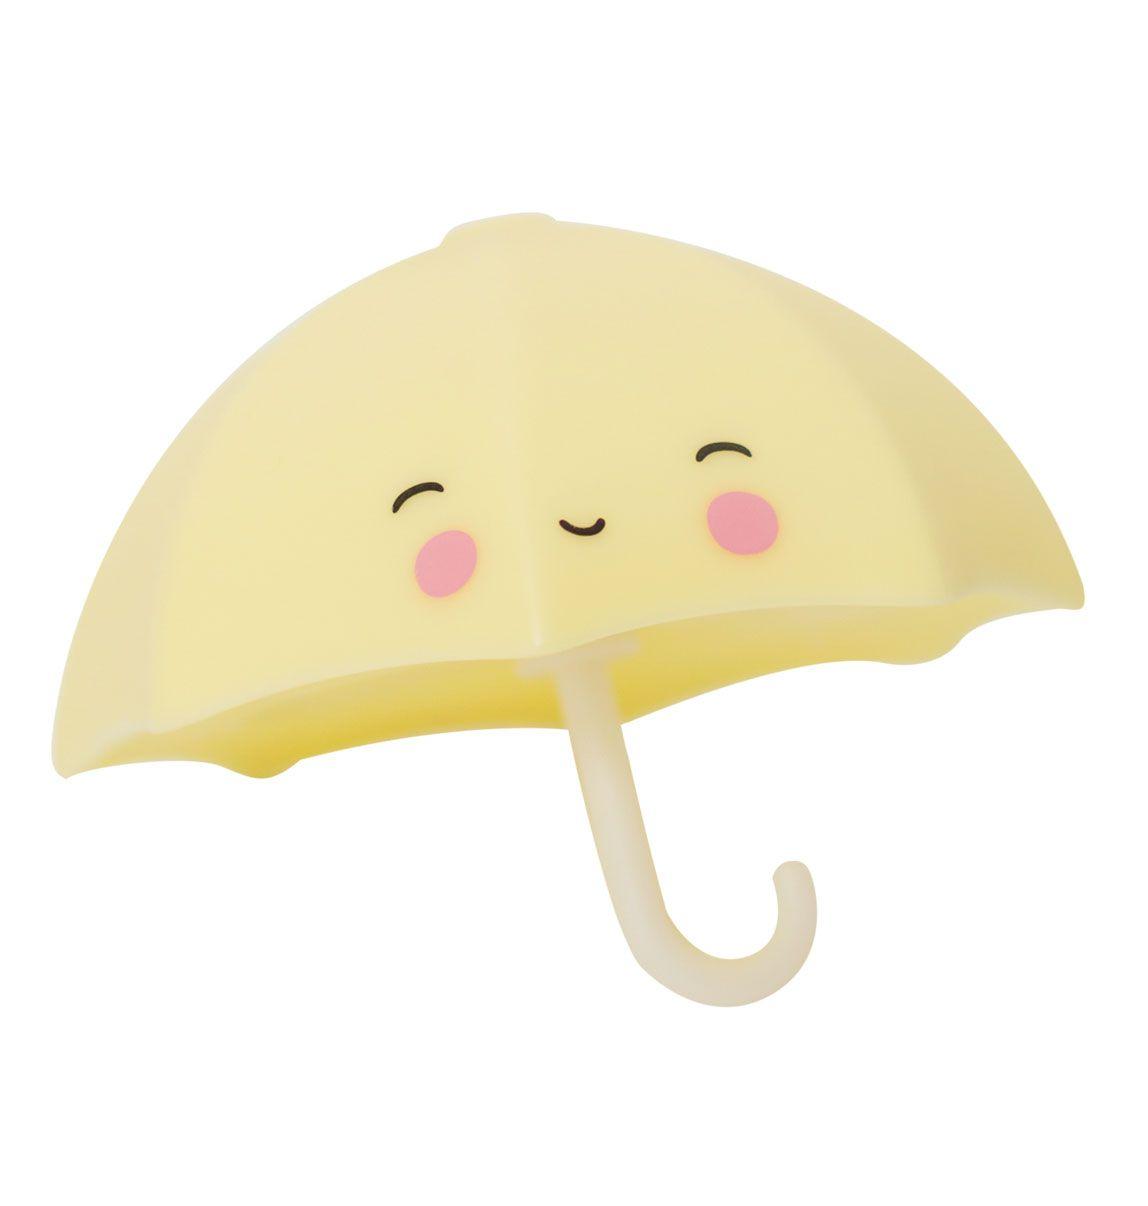 A Little Lovely Company Bath Toy - Umbrella